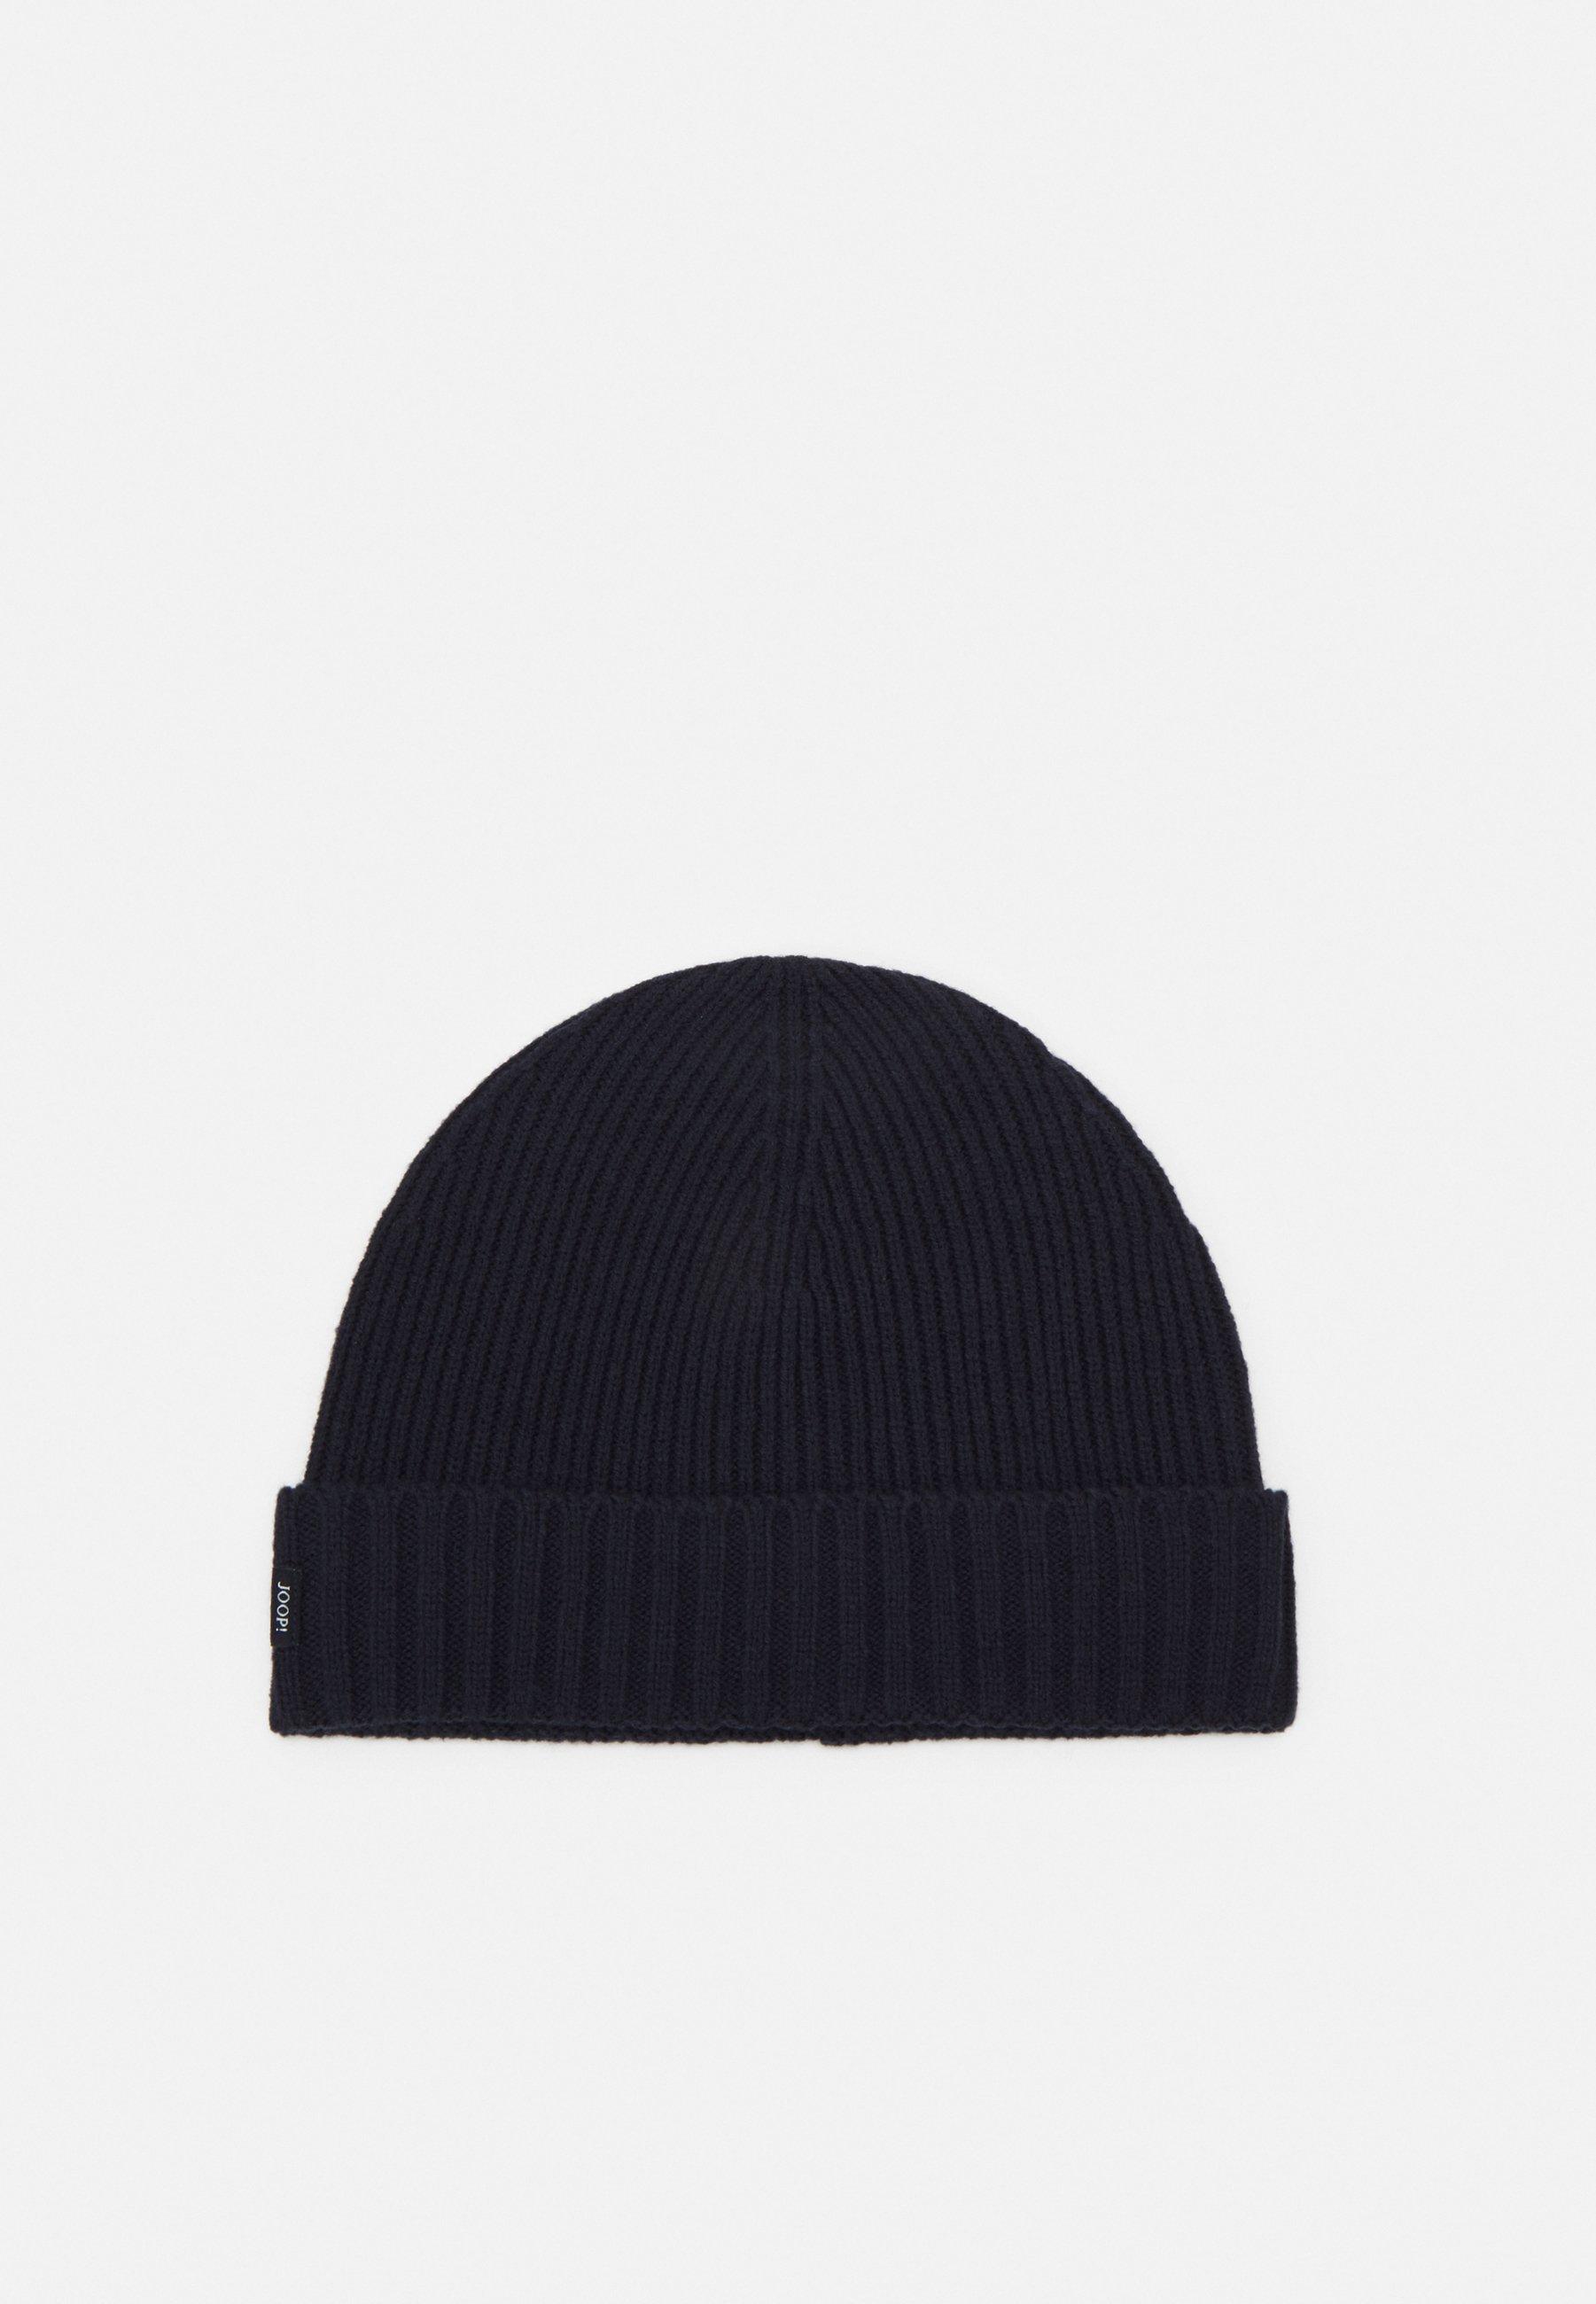 Joop! Francis - Mütze Dark Grey/grau